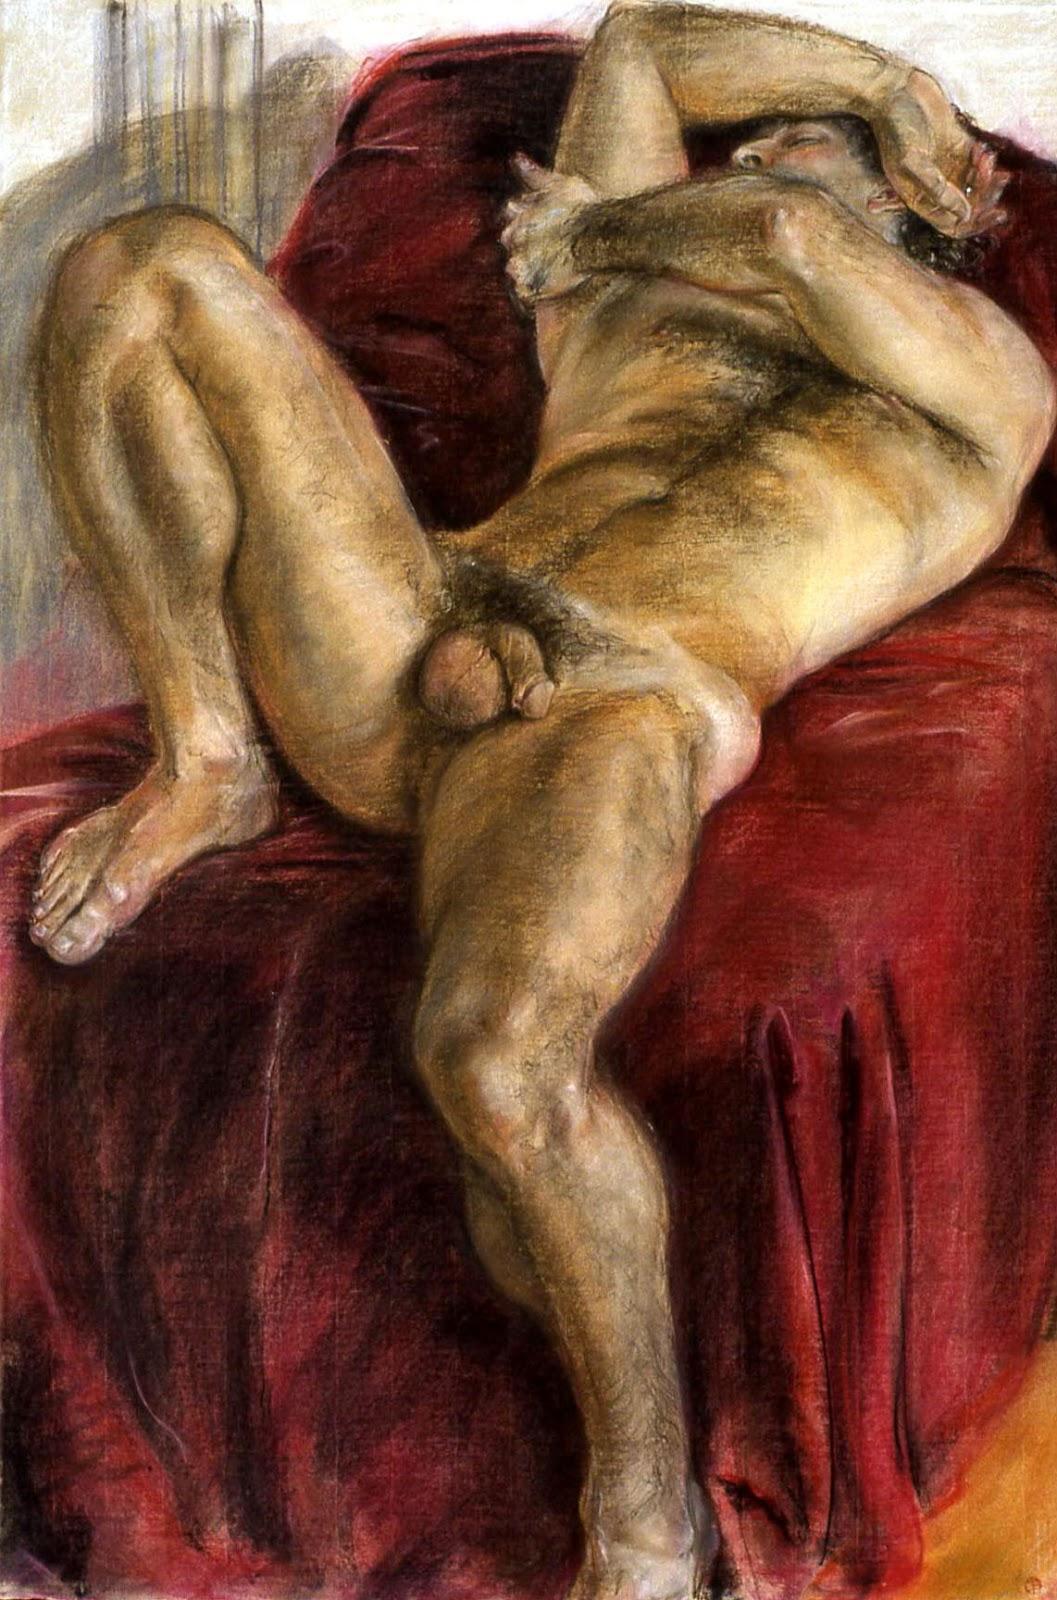 Pin By Eva Lucian On Art Of Man, Illustration